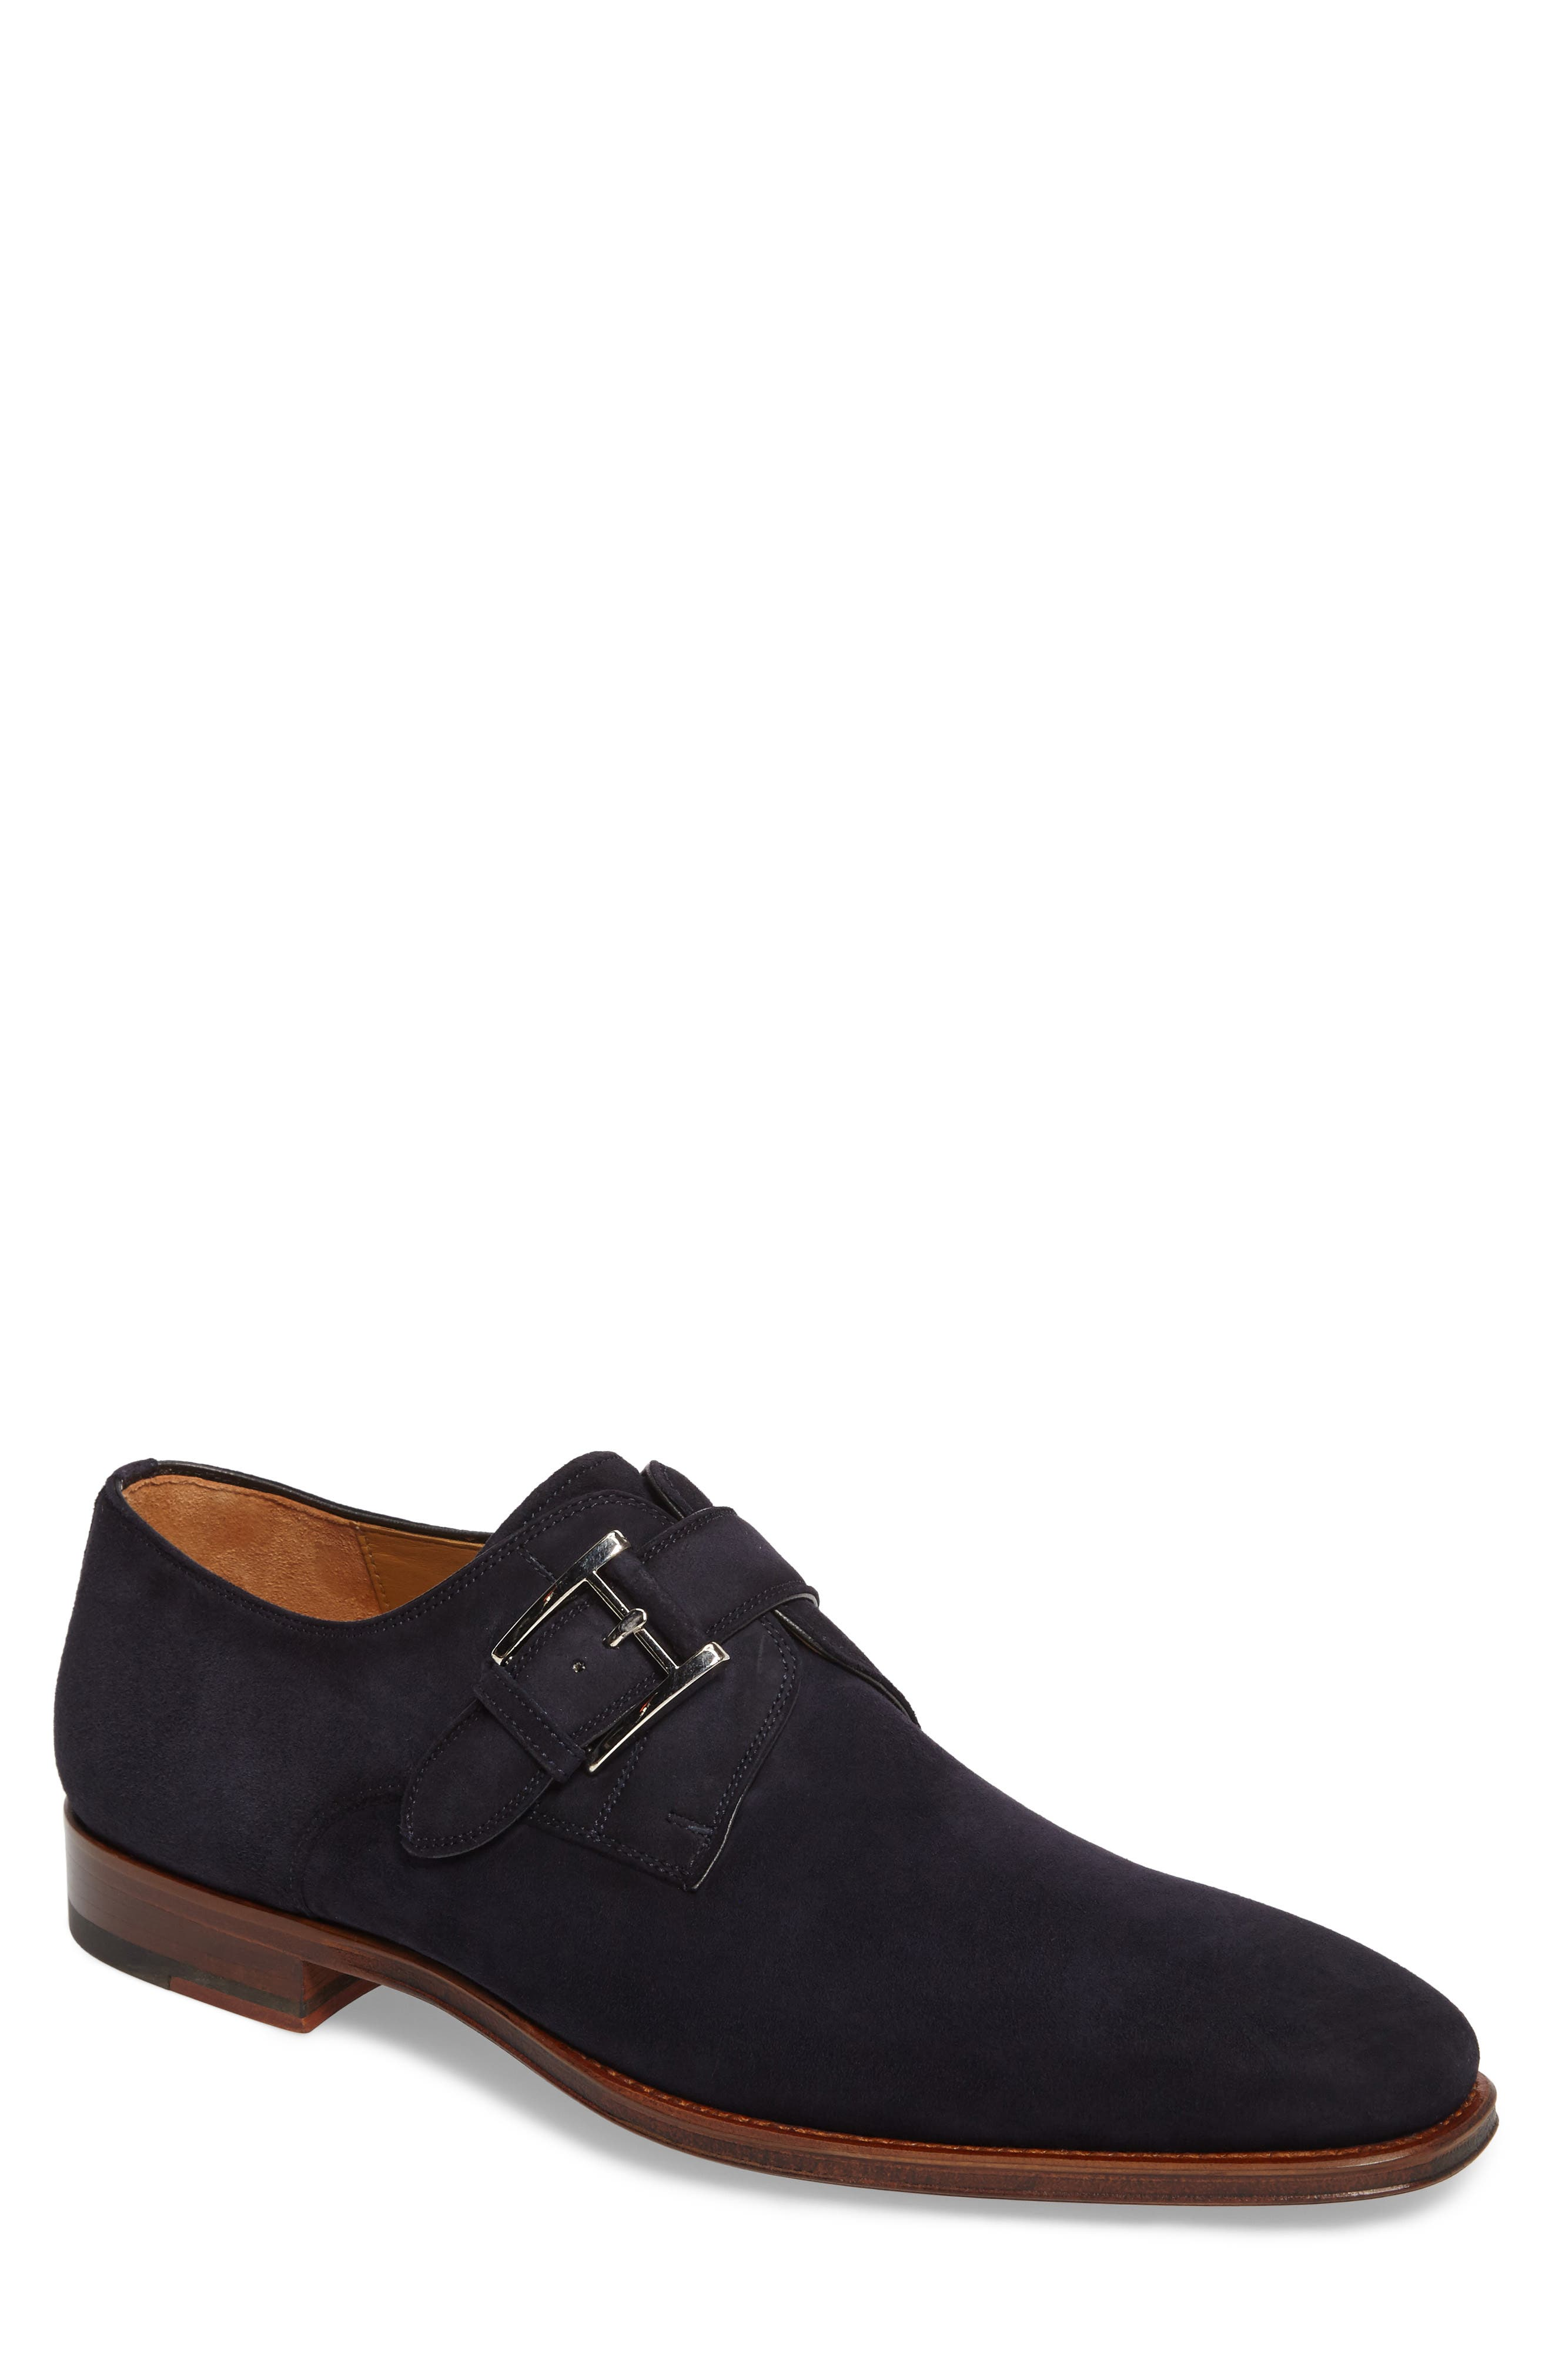 Enrique Monk Strap Shoe,                         Main,                         color, Navy Suede